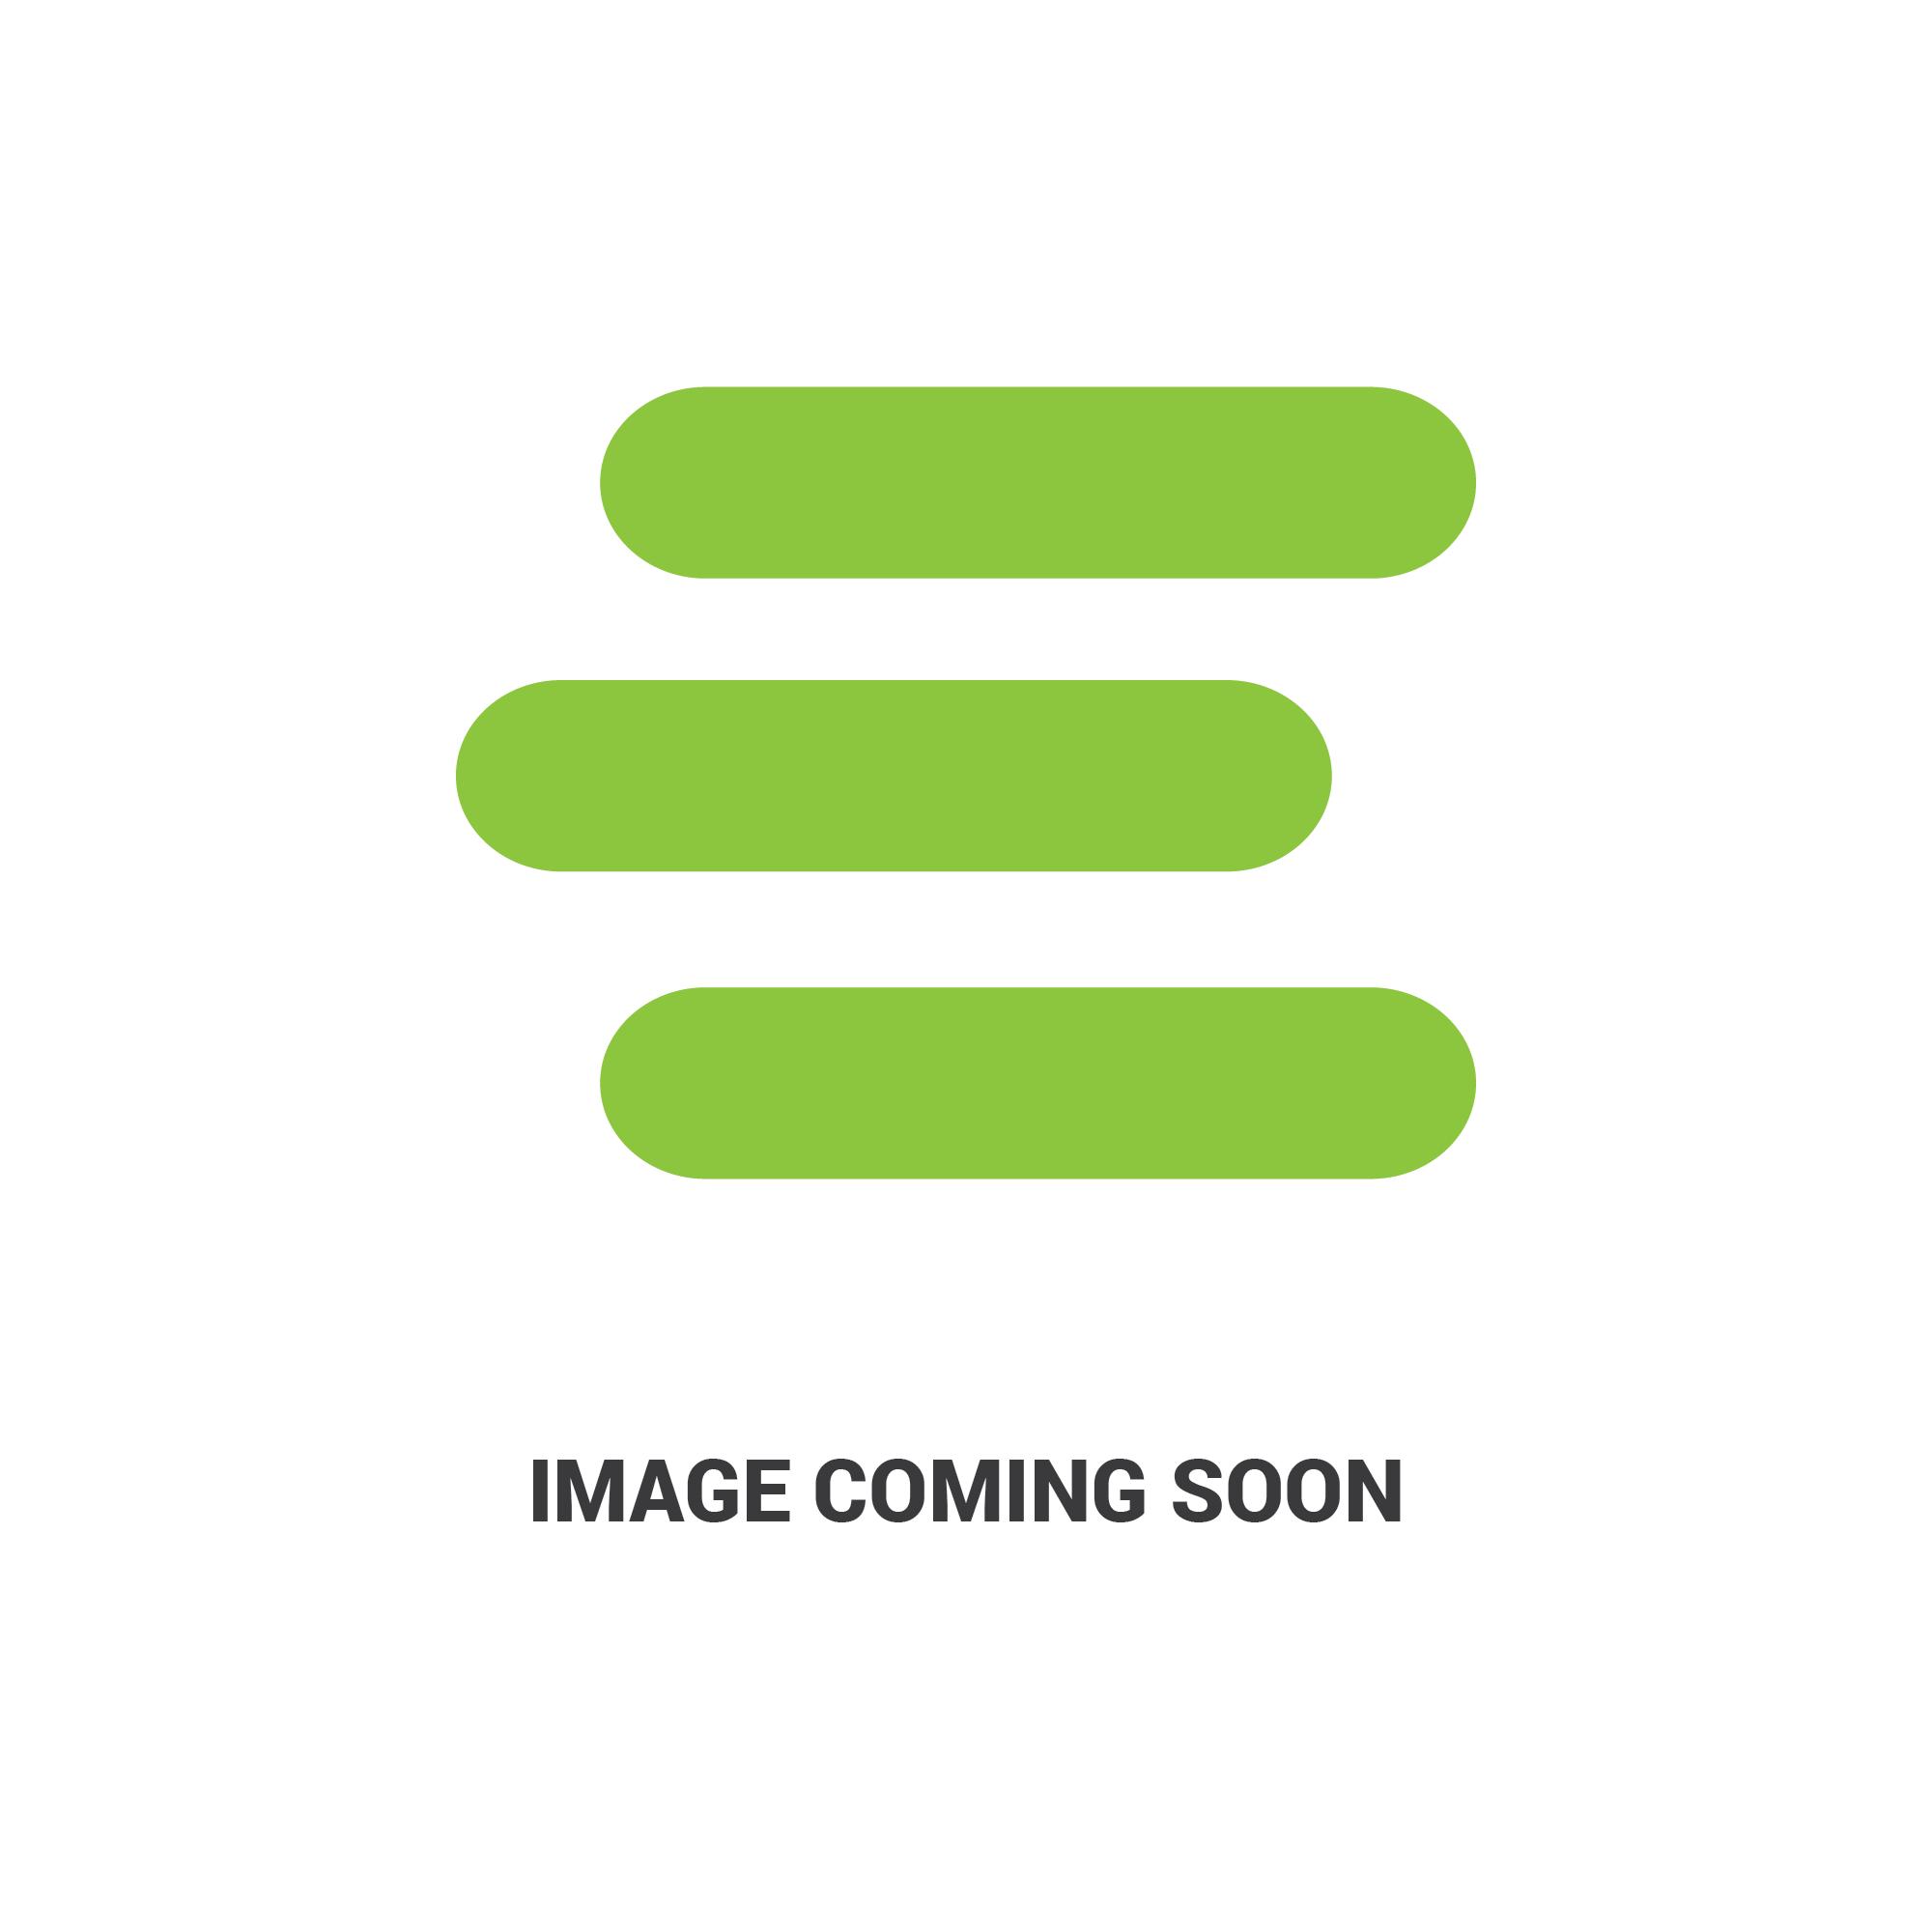 E-31351-27560edit 211.jpg